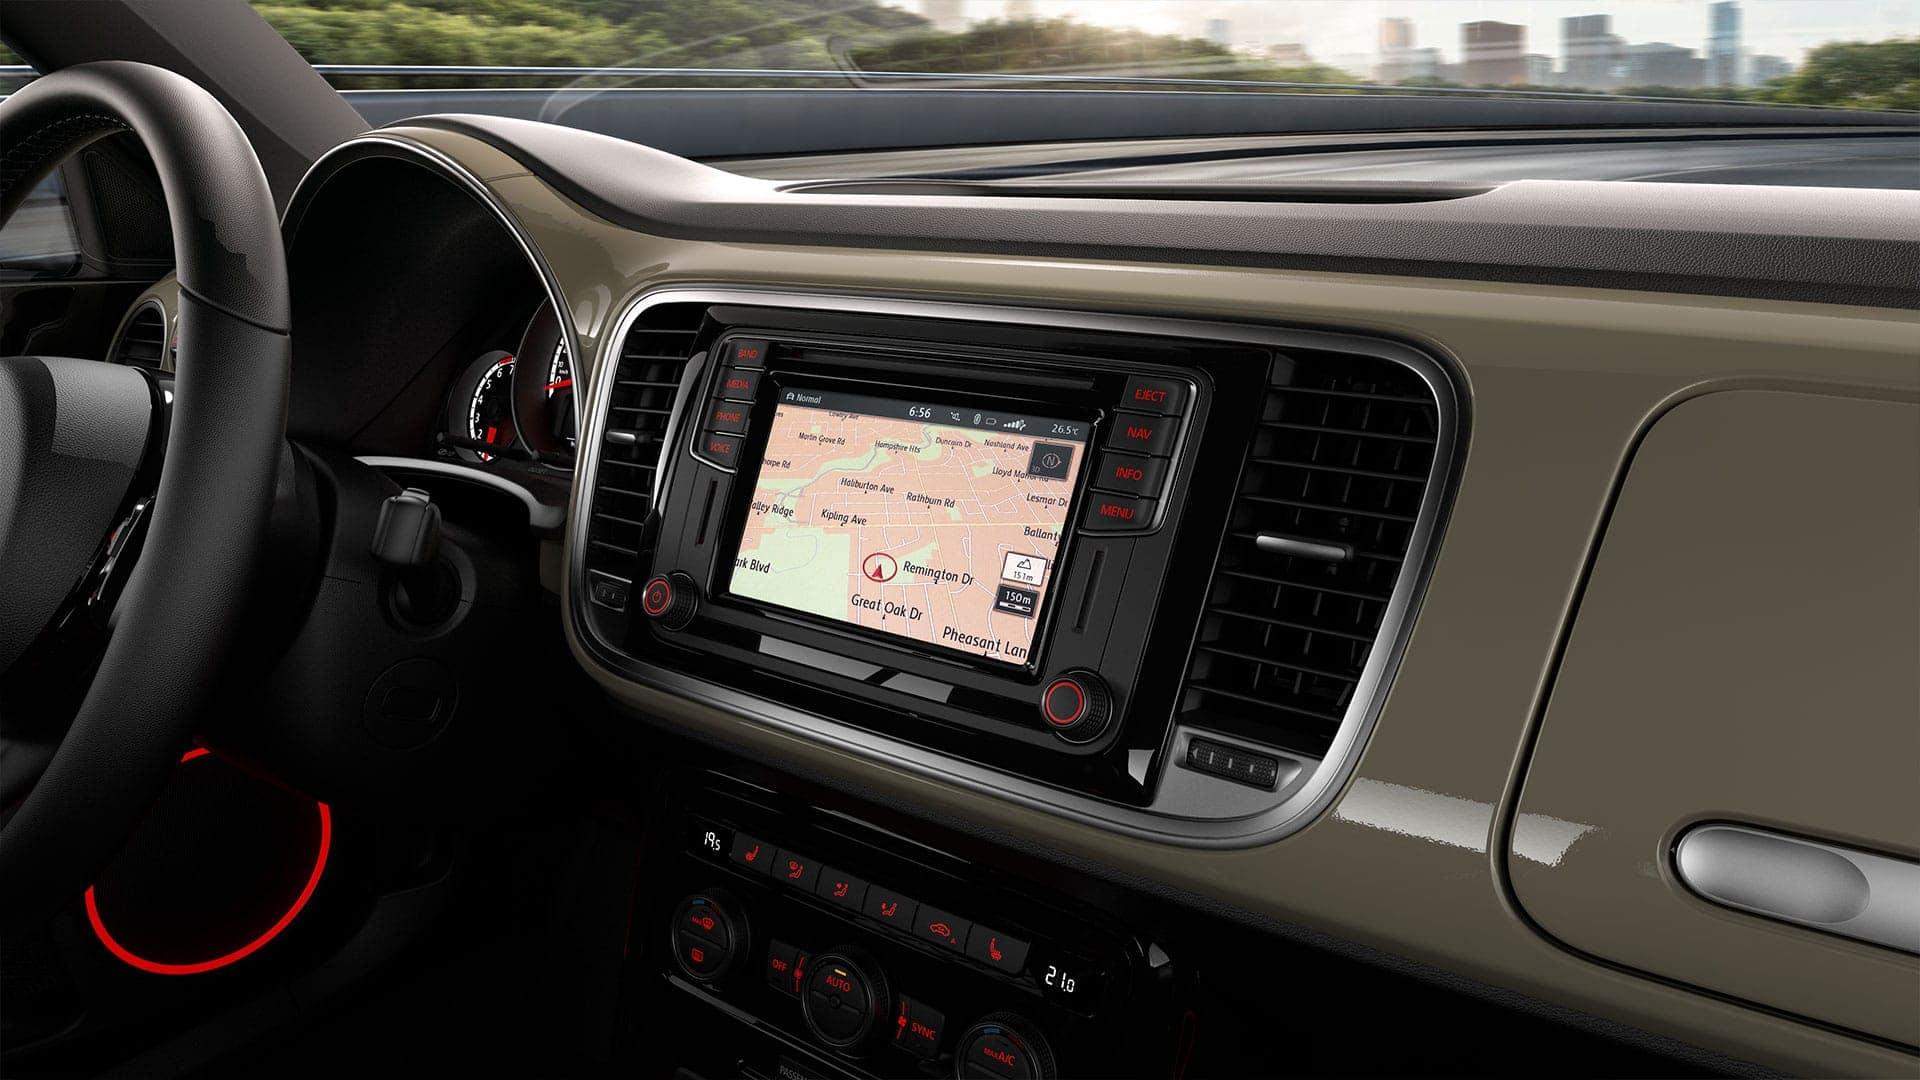 2019 VW Beetle navigation